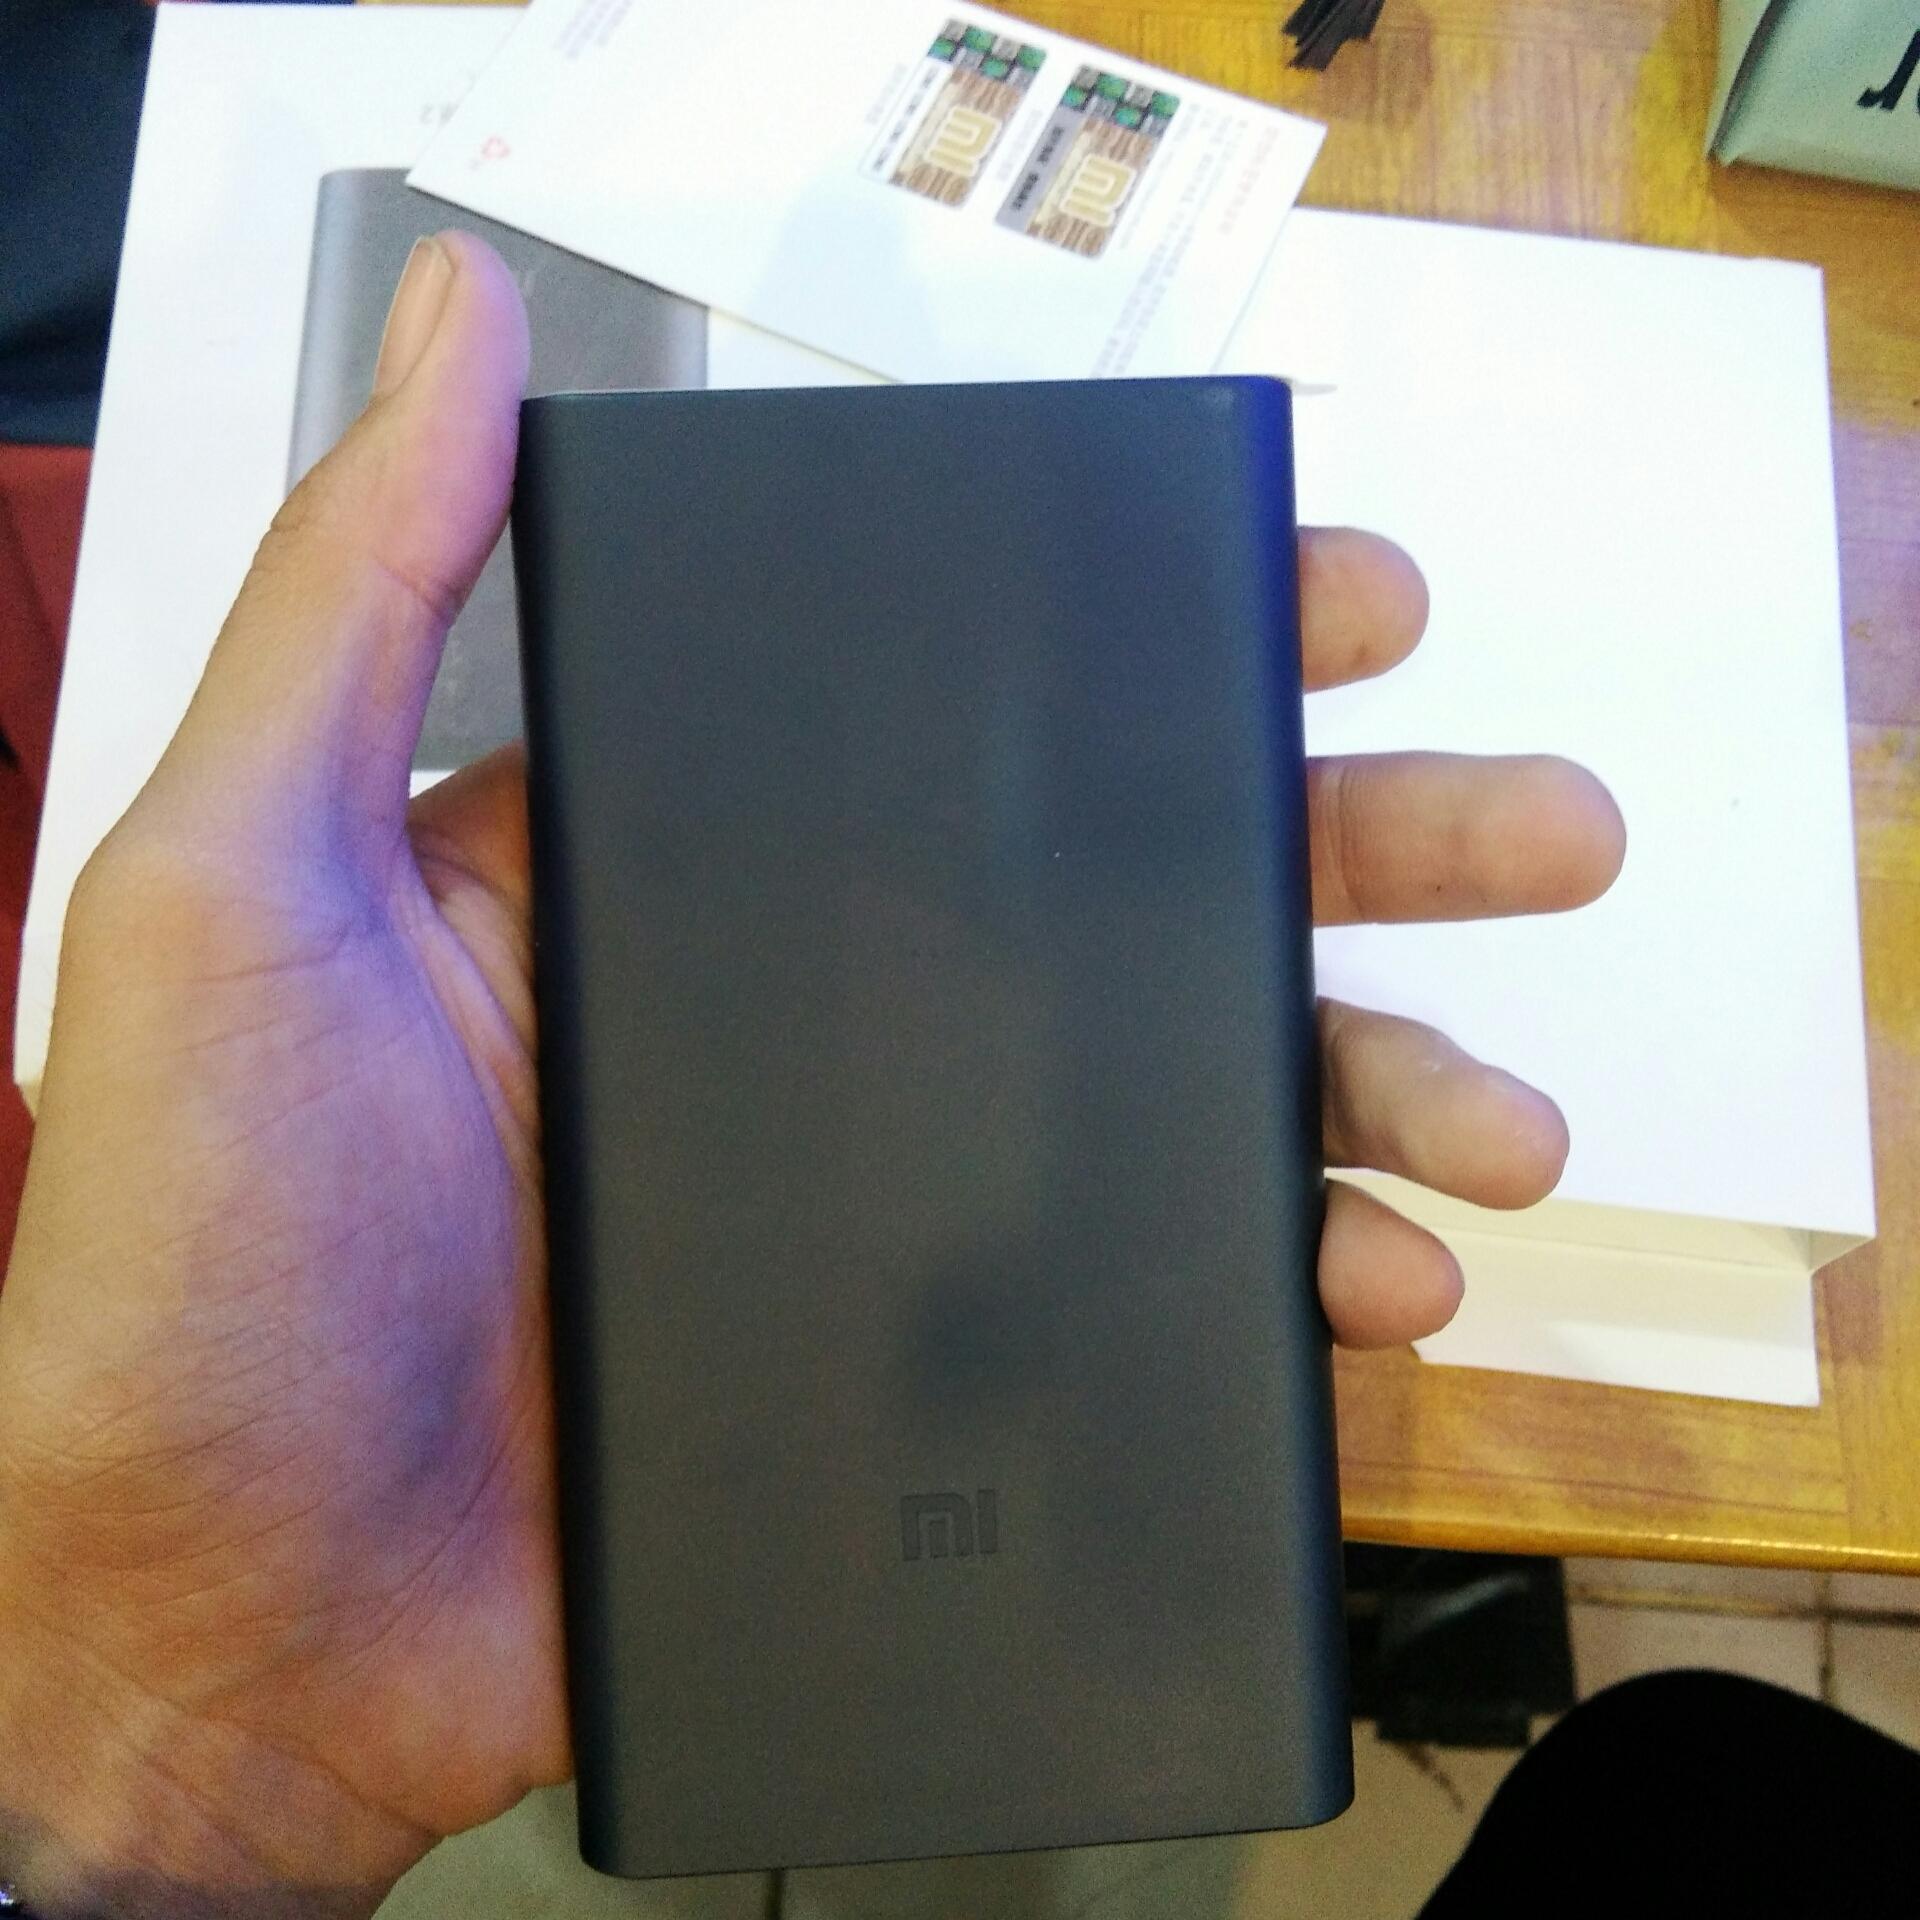 Cek Harga Baru Powerbank Xiaomi Mi Pro 2 10000mah Fast Charging Original Quick Charge 3